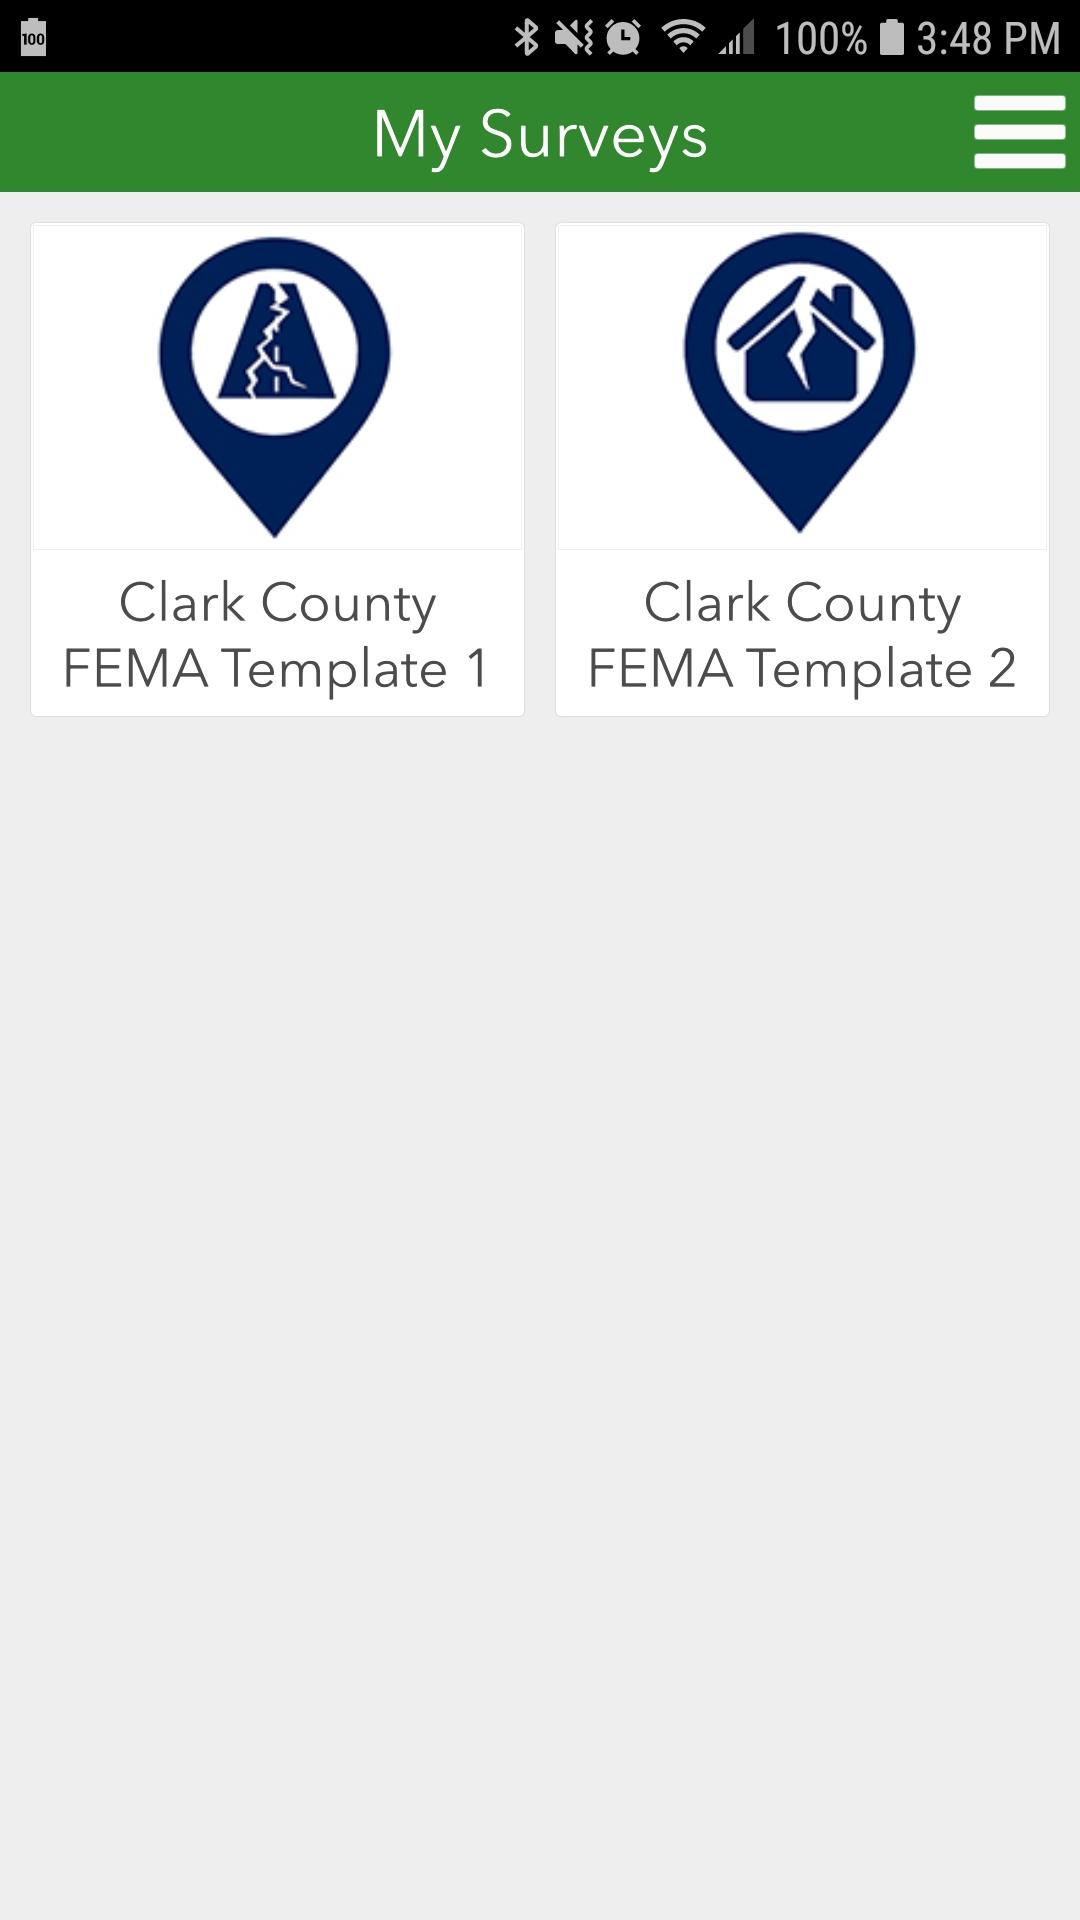 Survey 123 - Using FEMA Templates